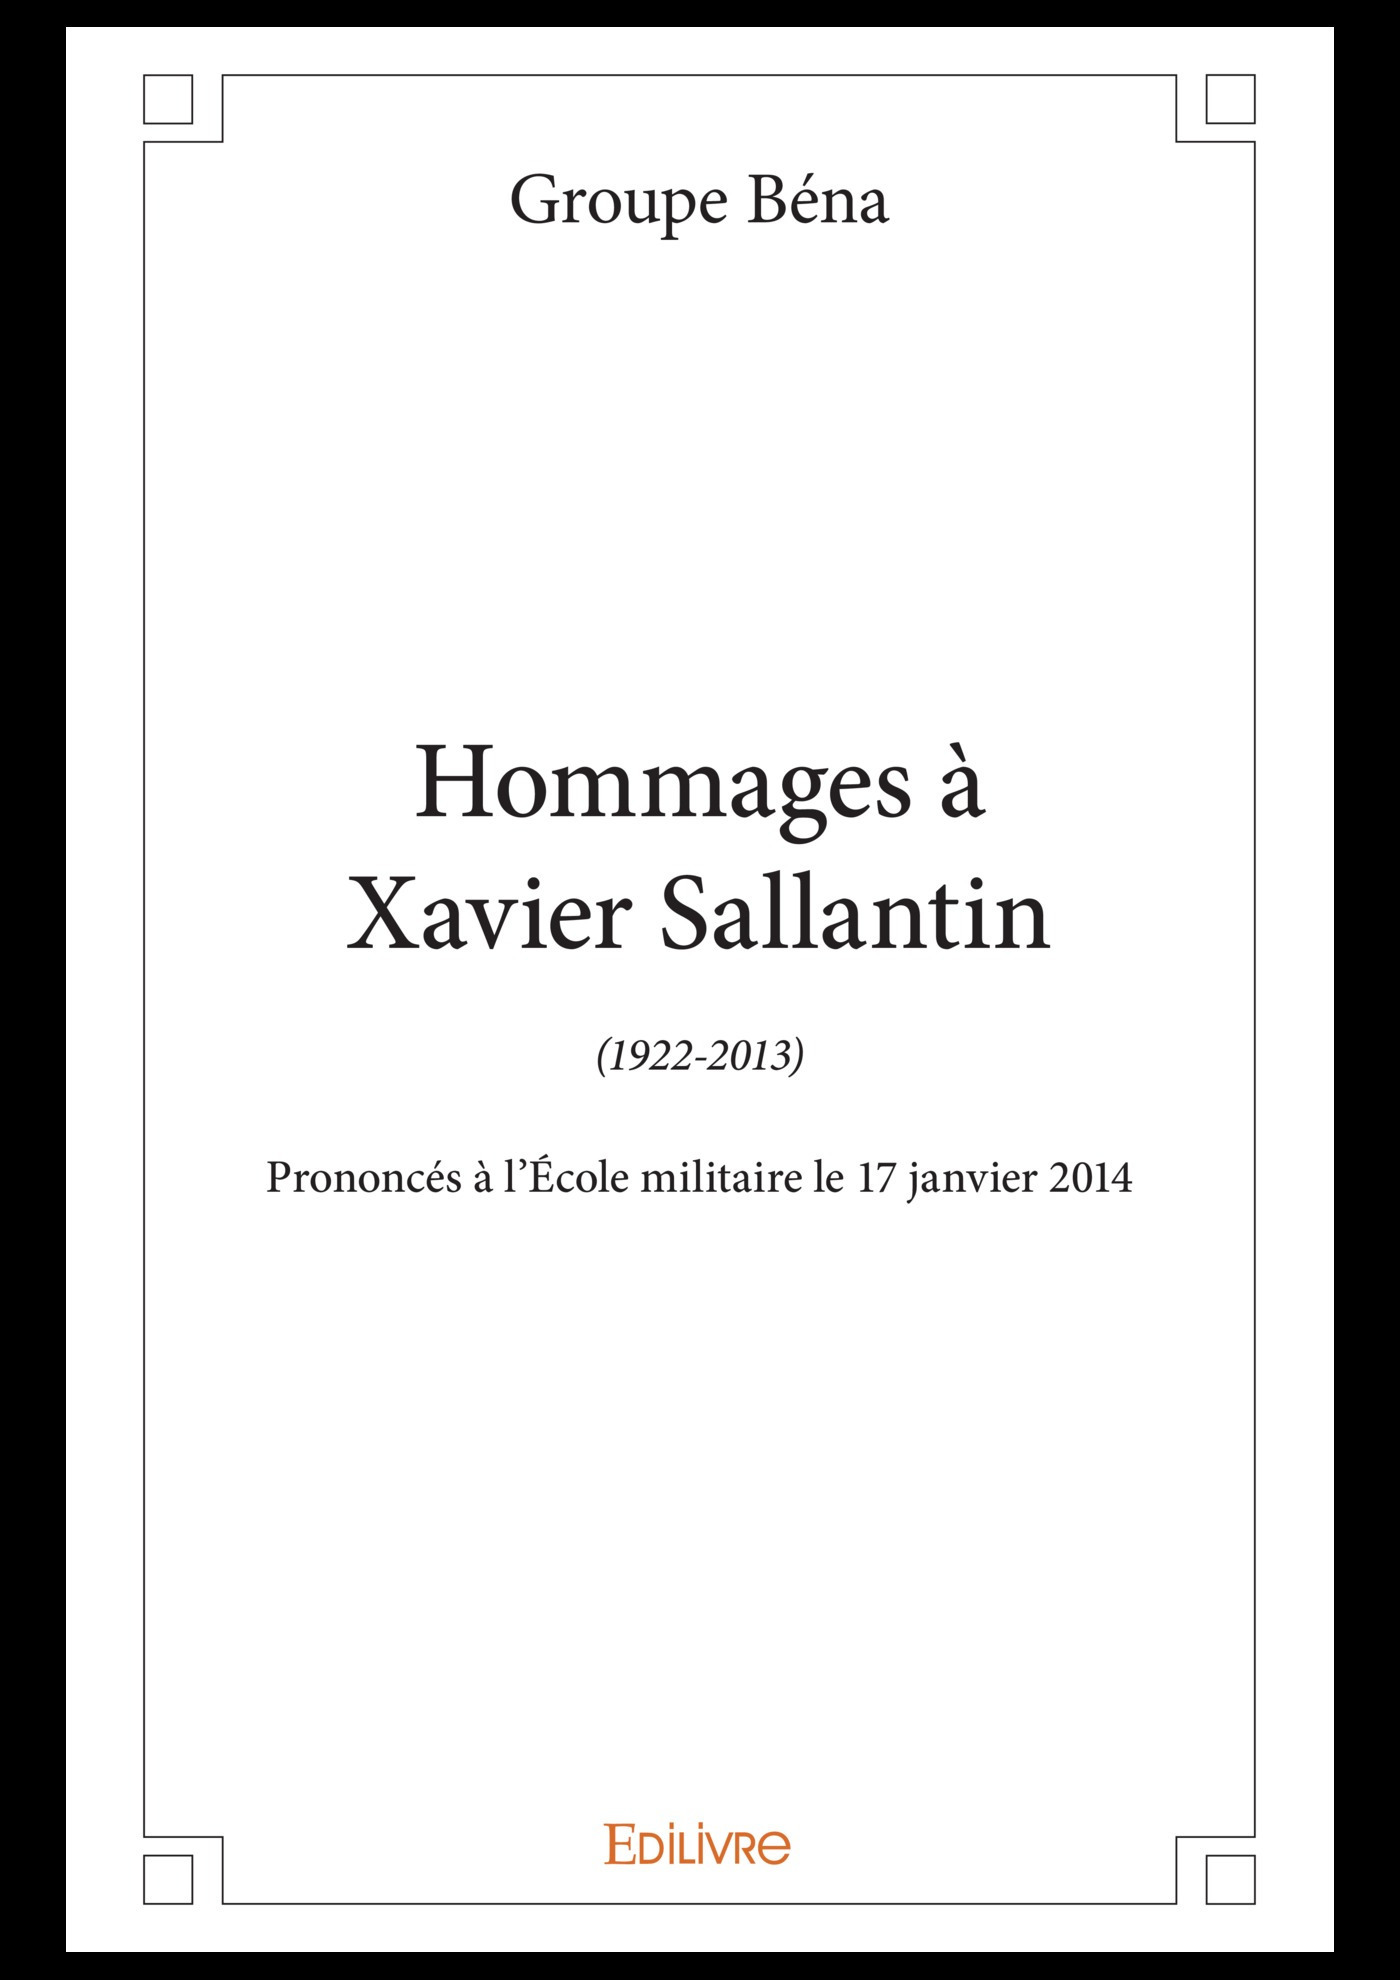 Hommages a xavier sallantin 1922-2013